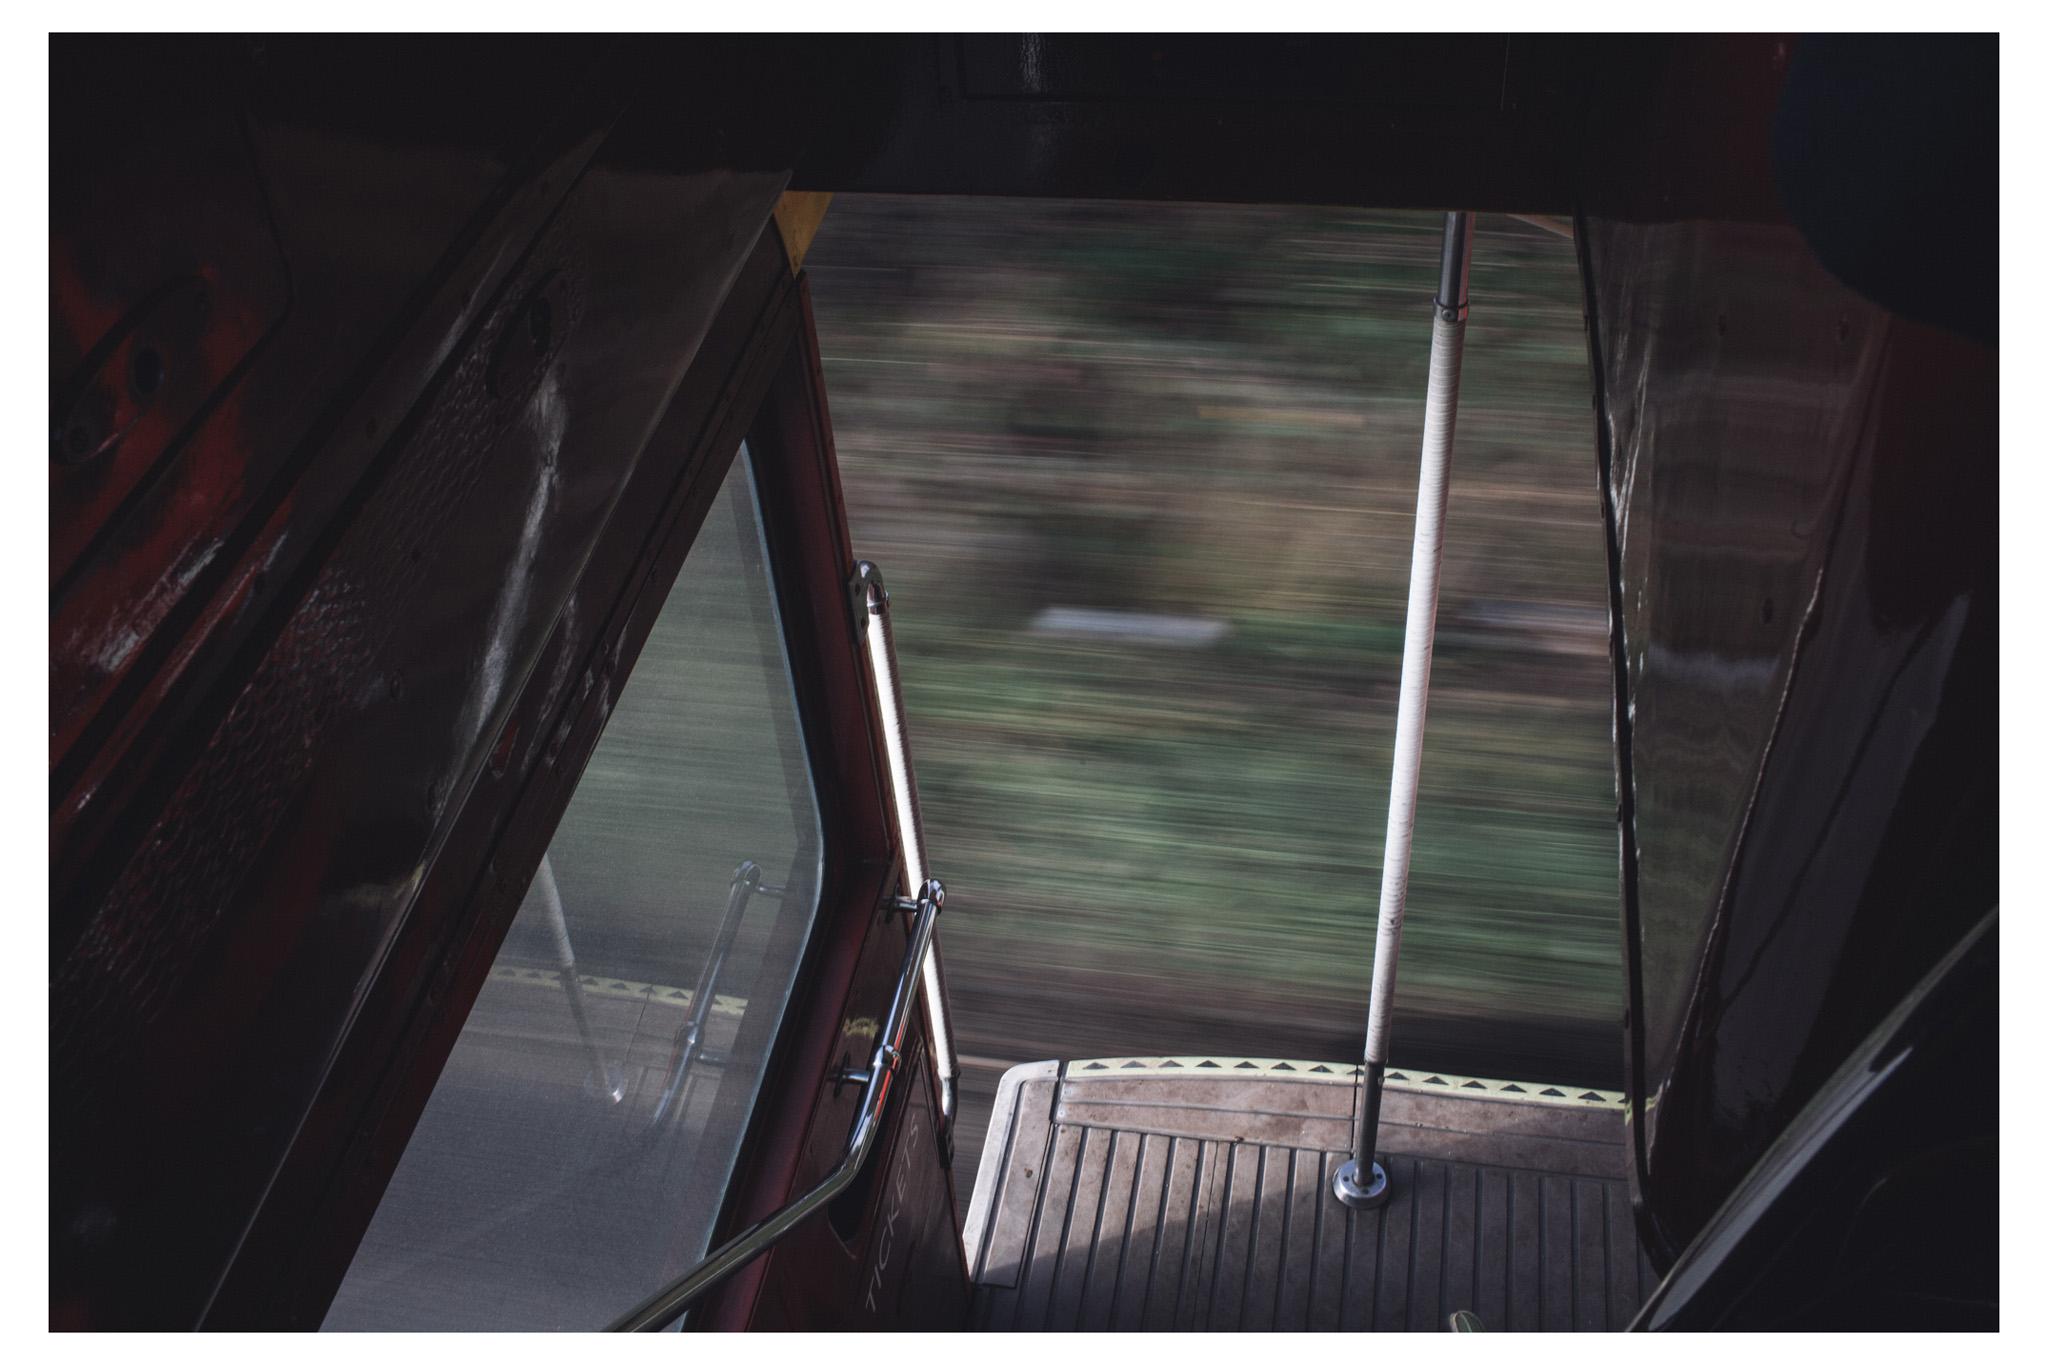 burnout_bus.jpg